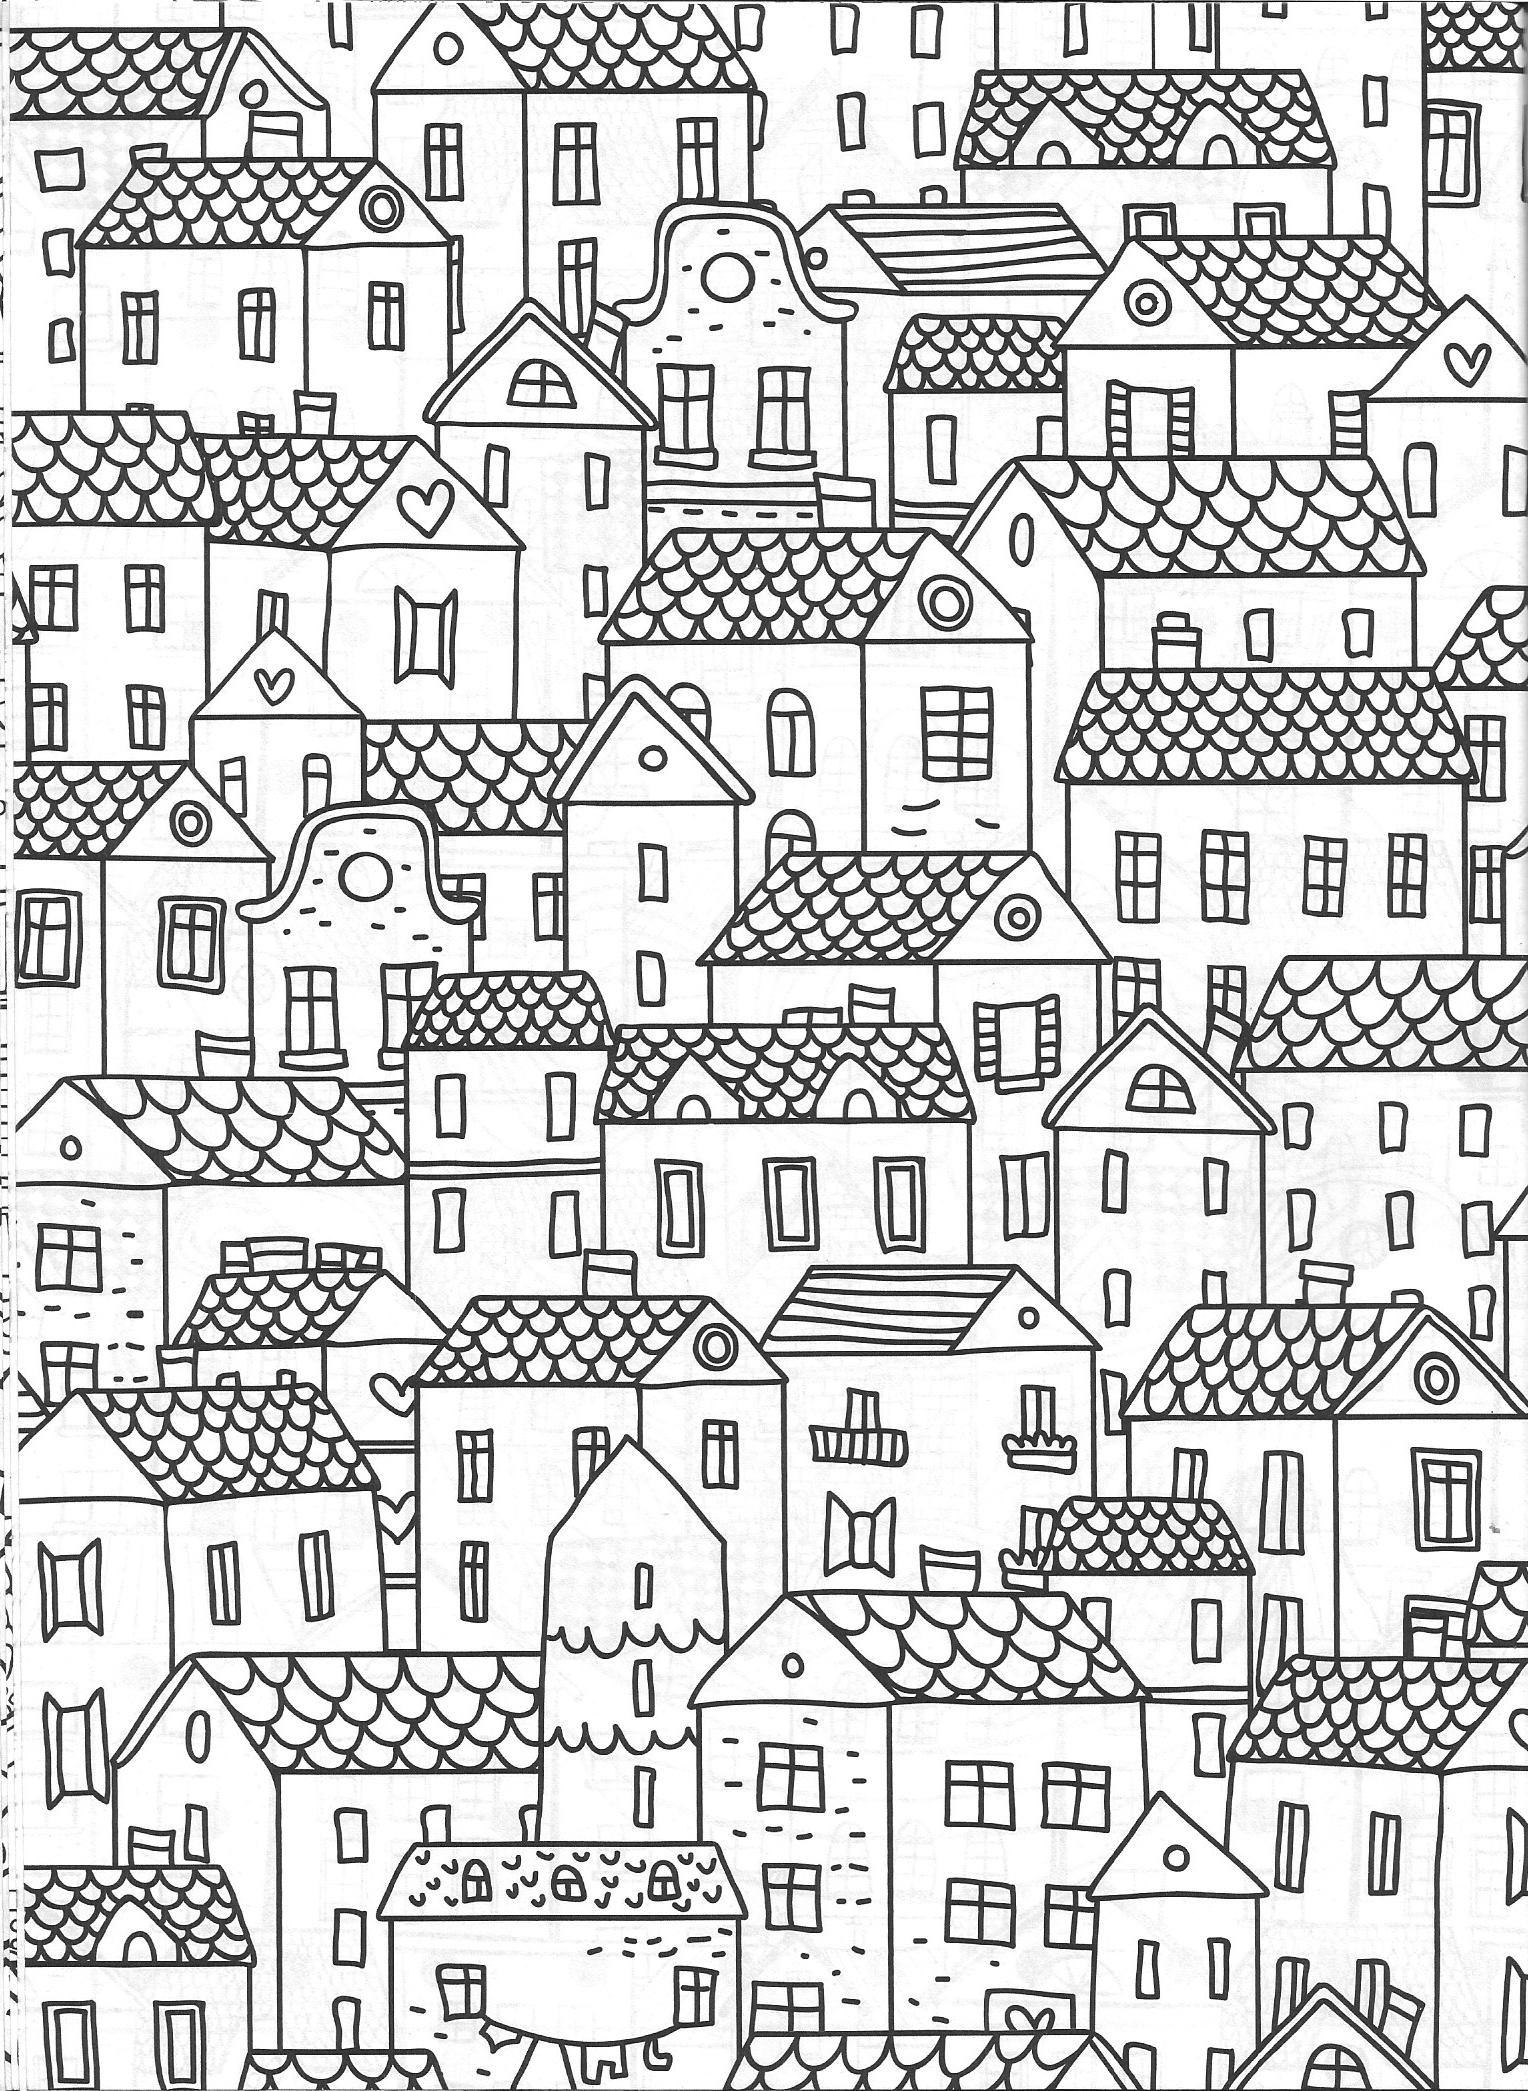 Cityscape Coloring Page Vida Simples Cidade Dos Sonhos Coloring Pages Ink Doodles Colouring Pages